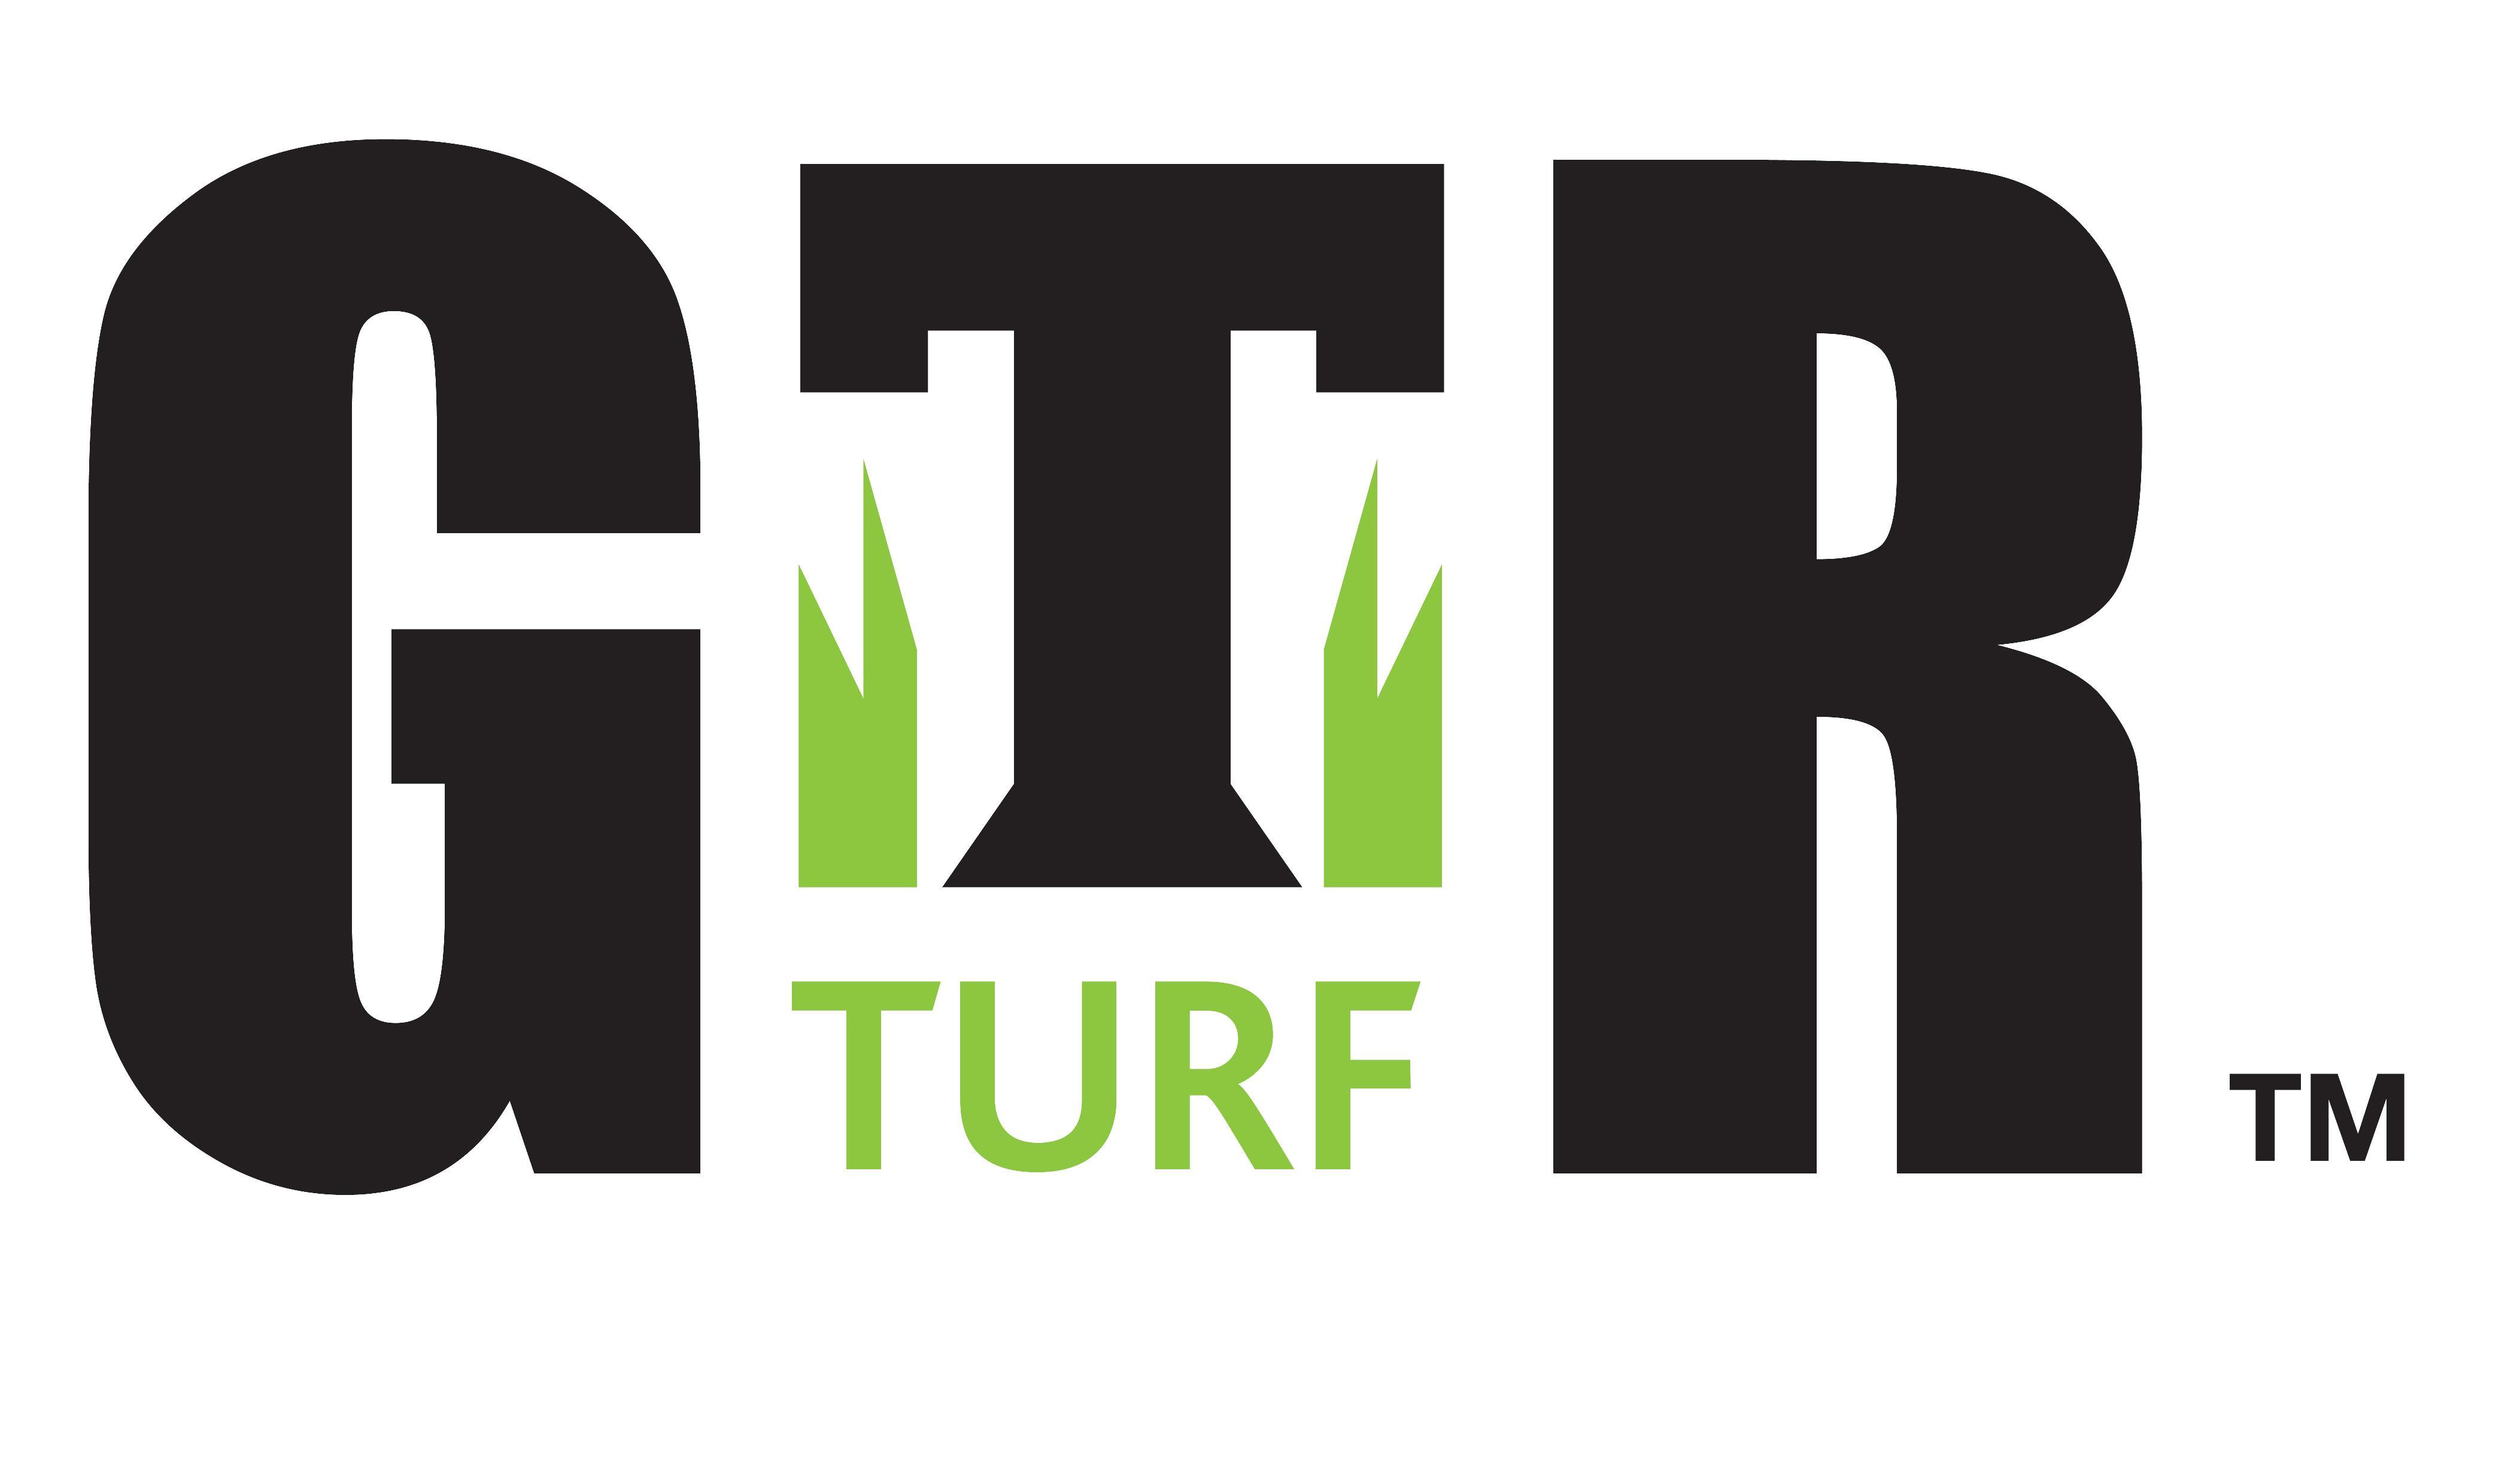 GTR Turf logo